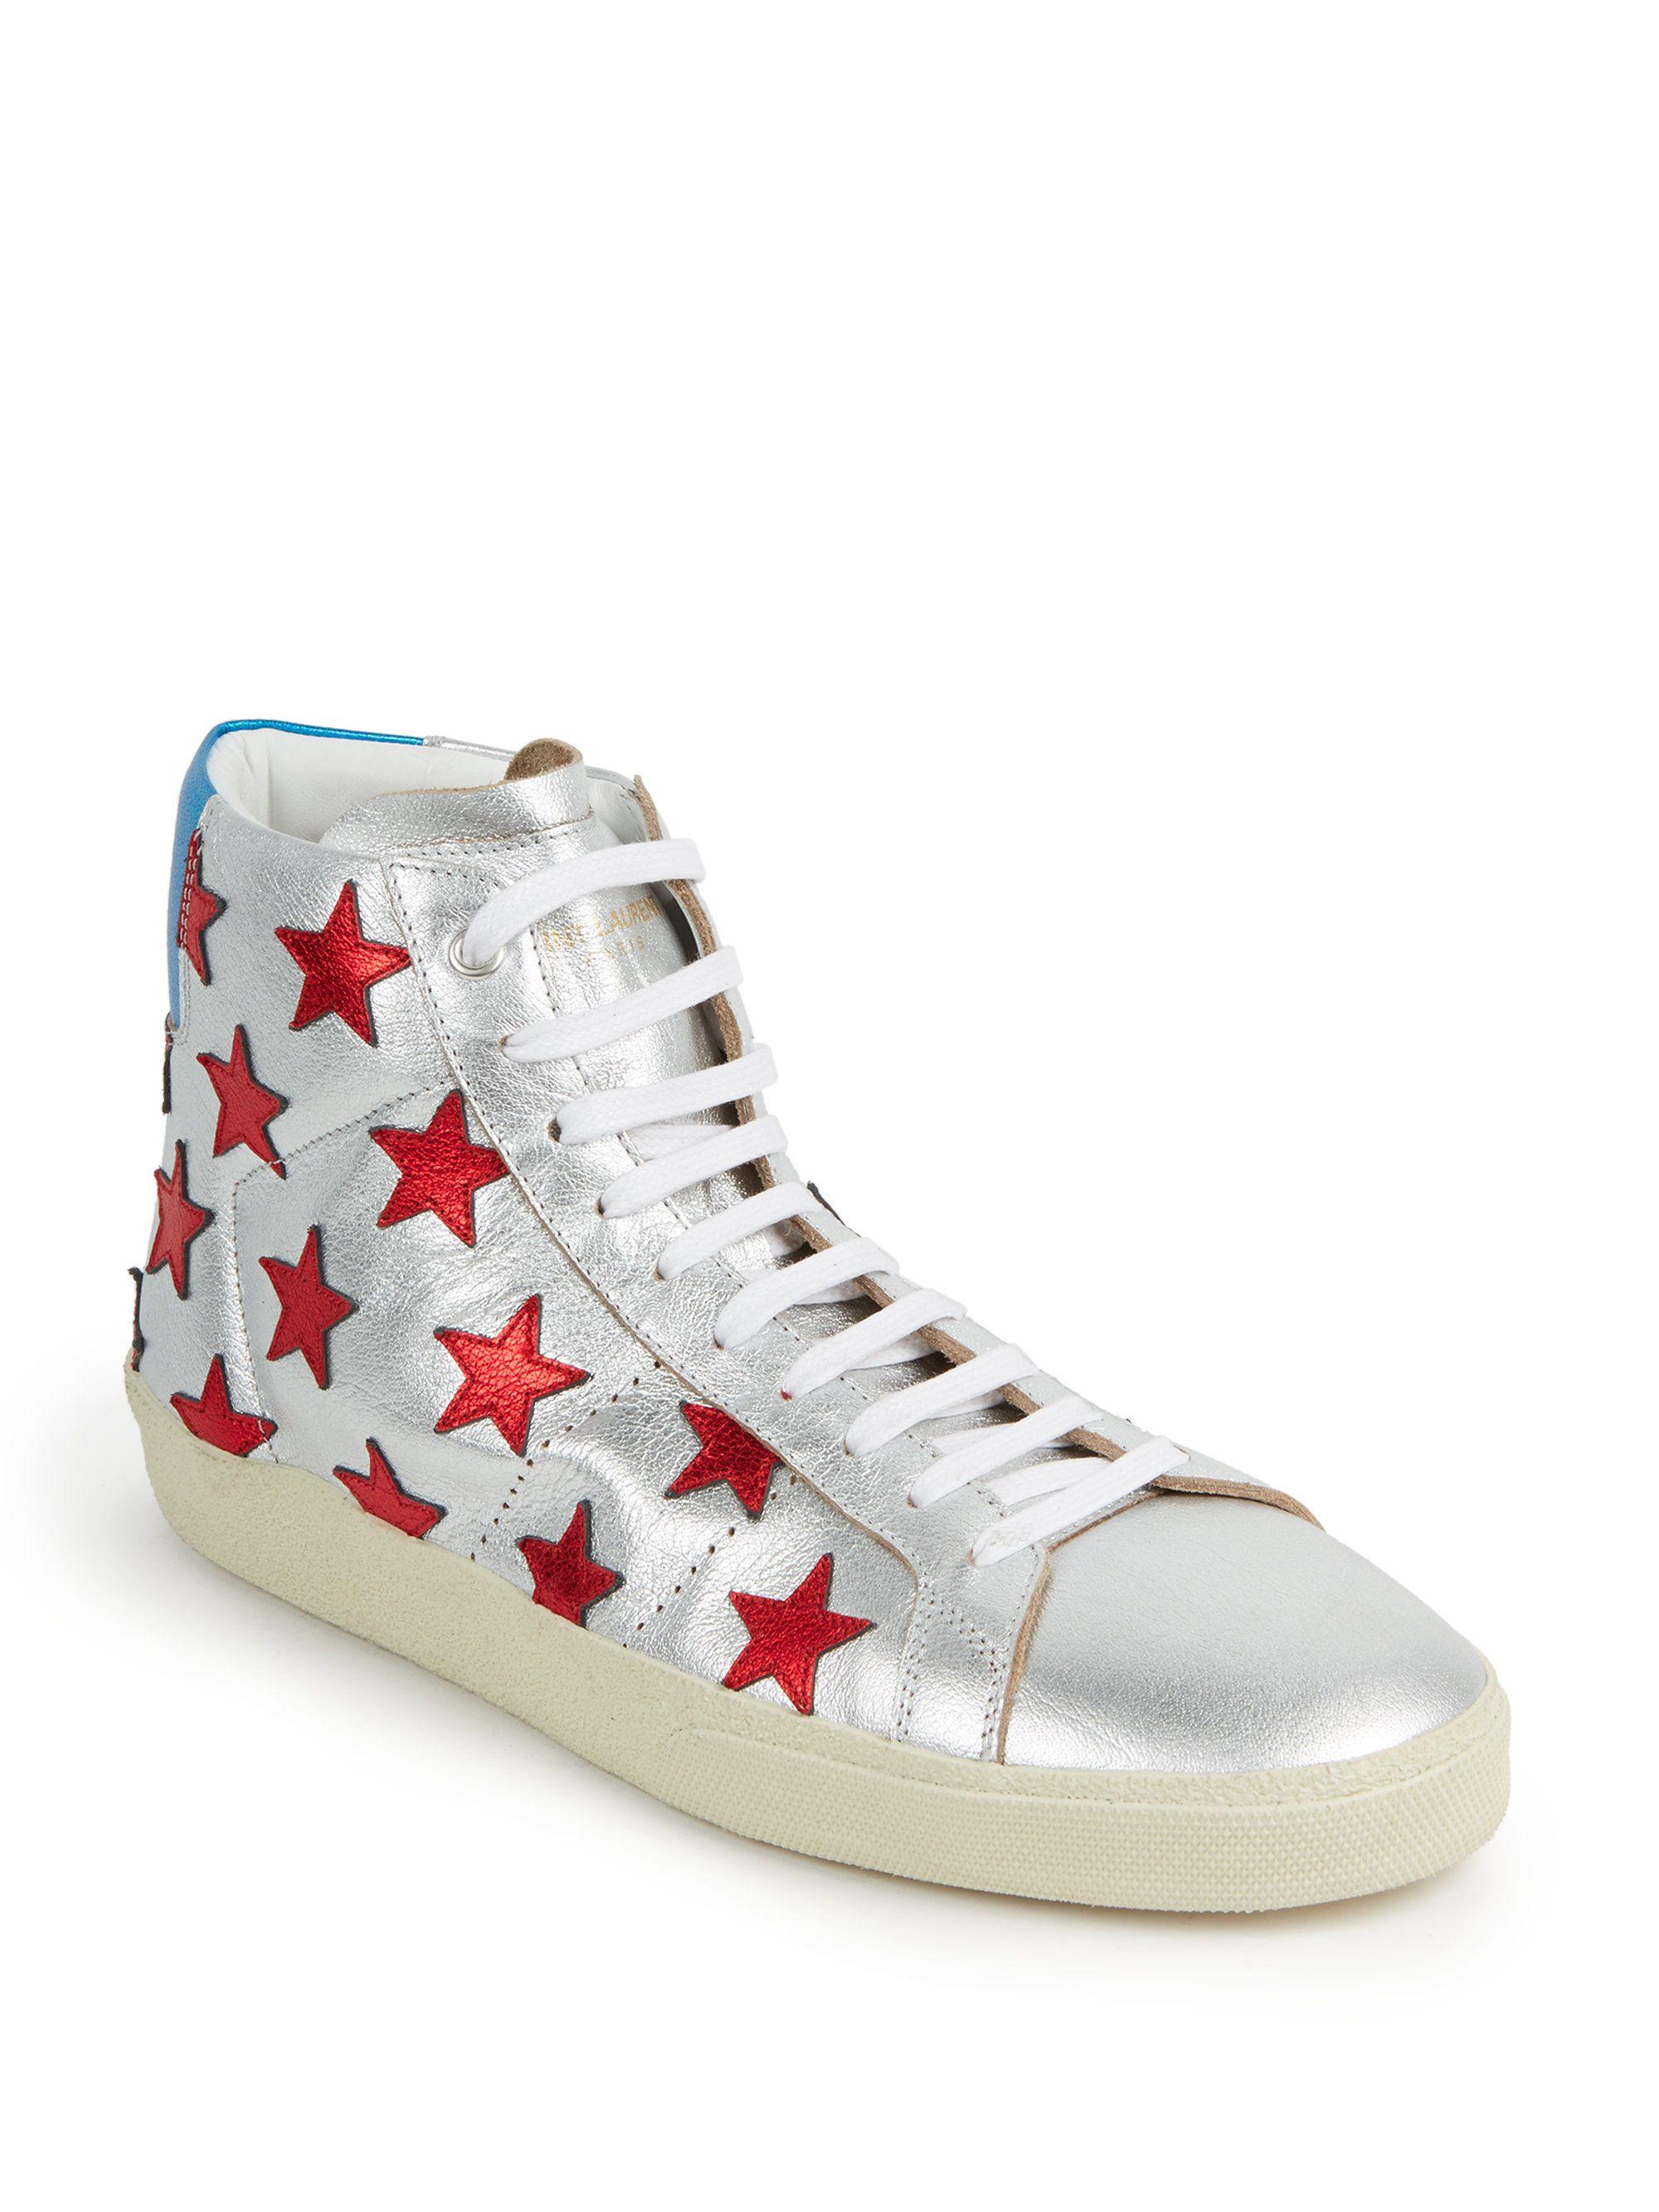 High top sneakers, Sneakers, Saint laurent